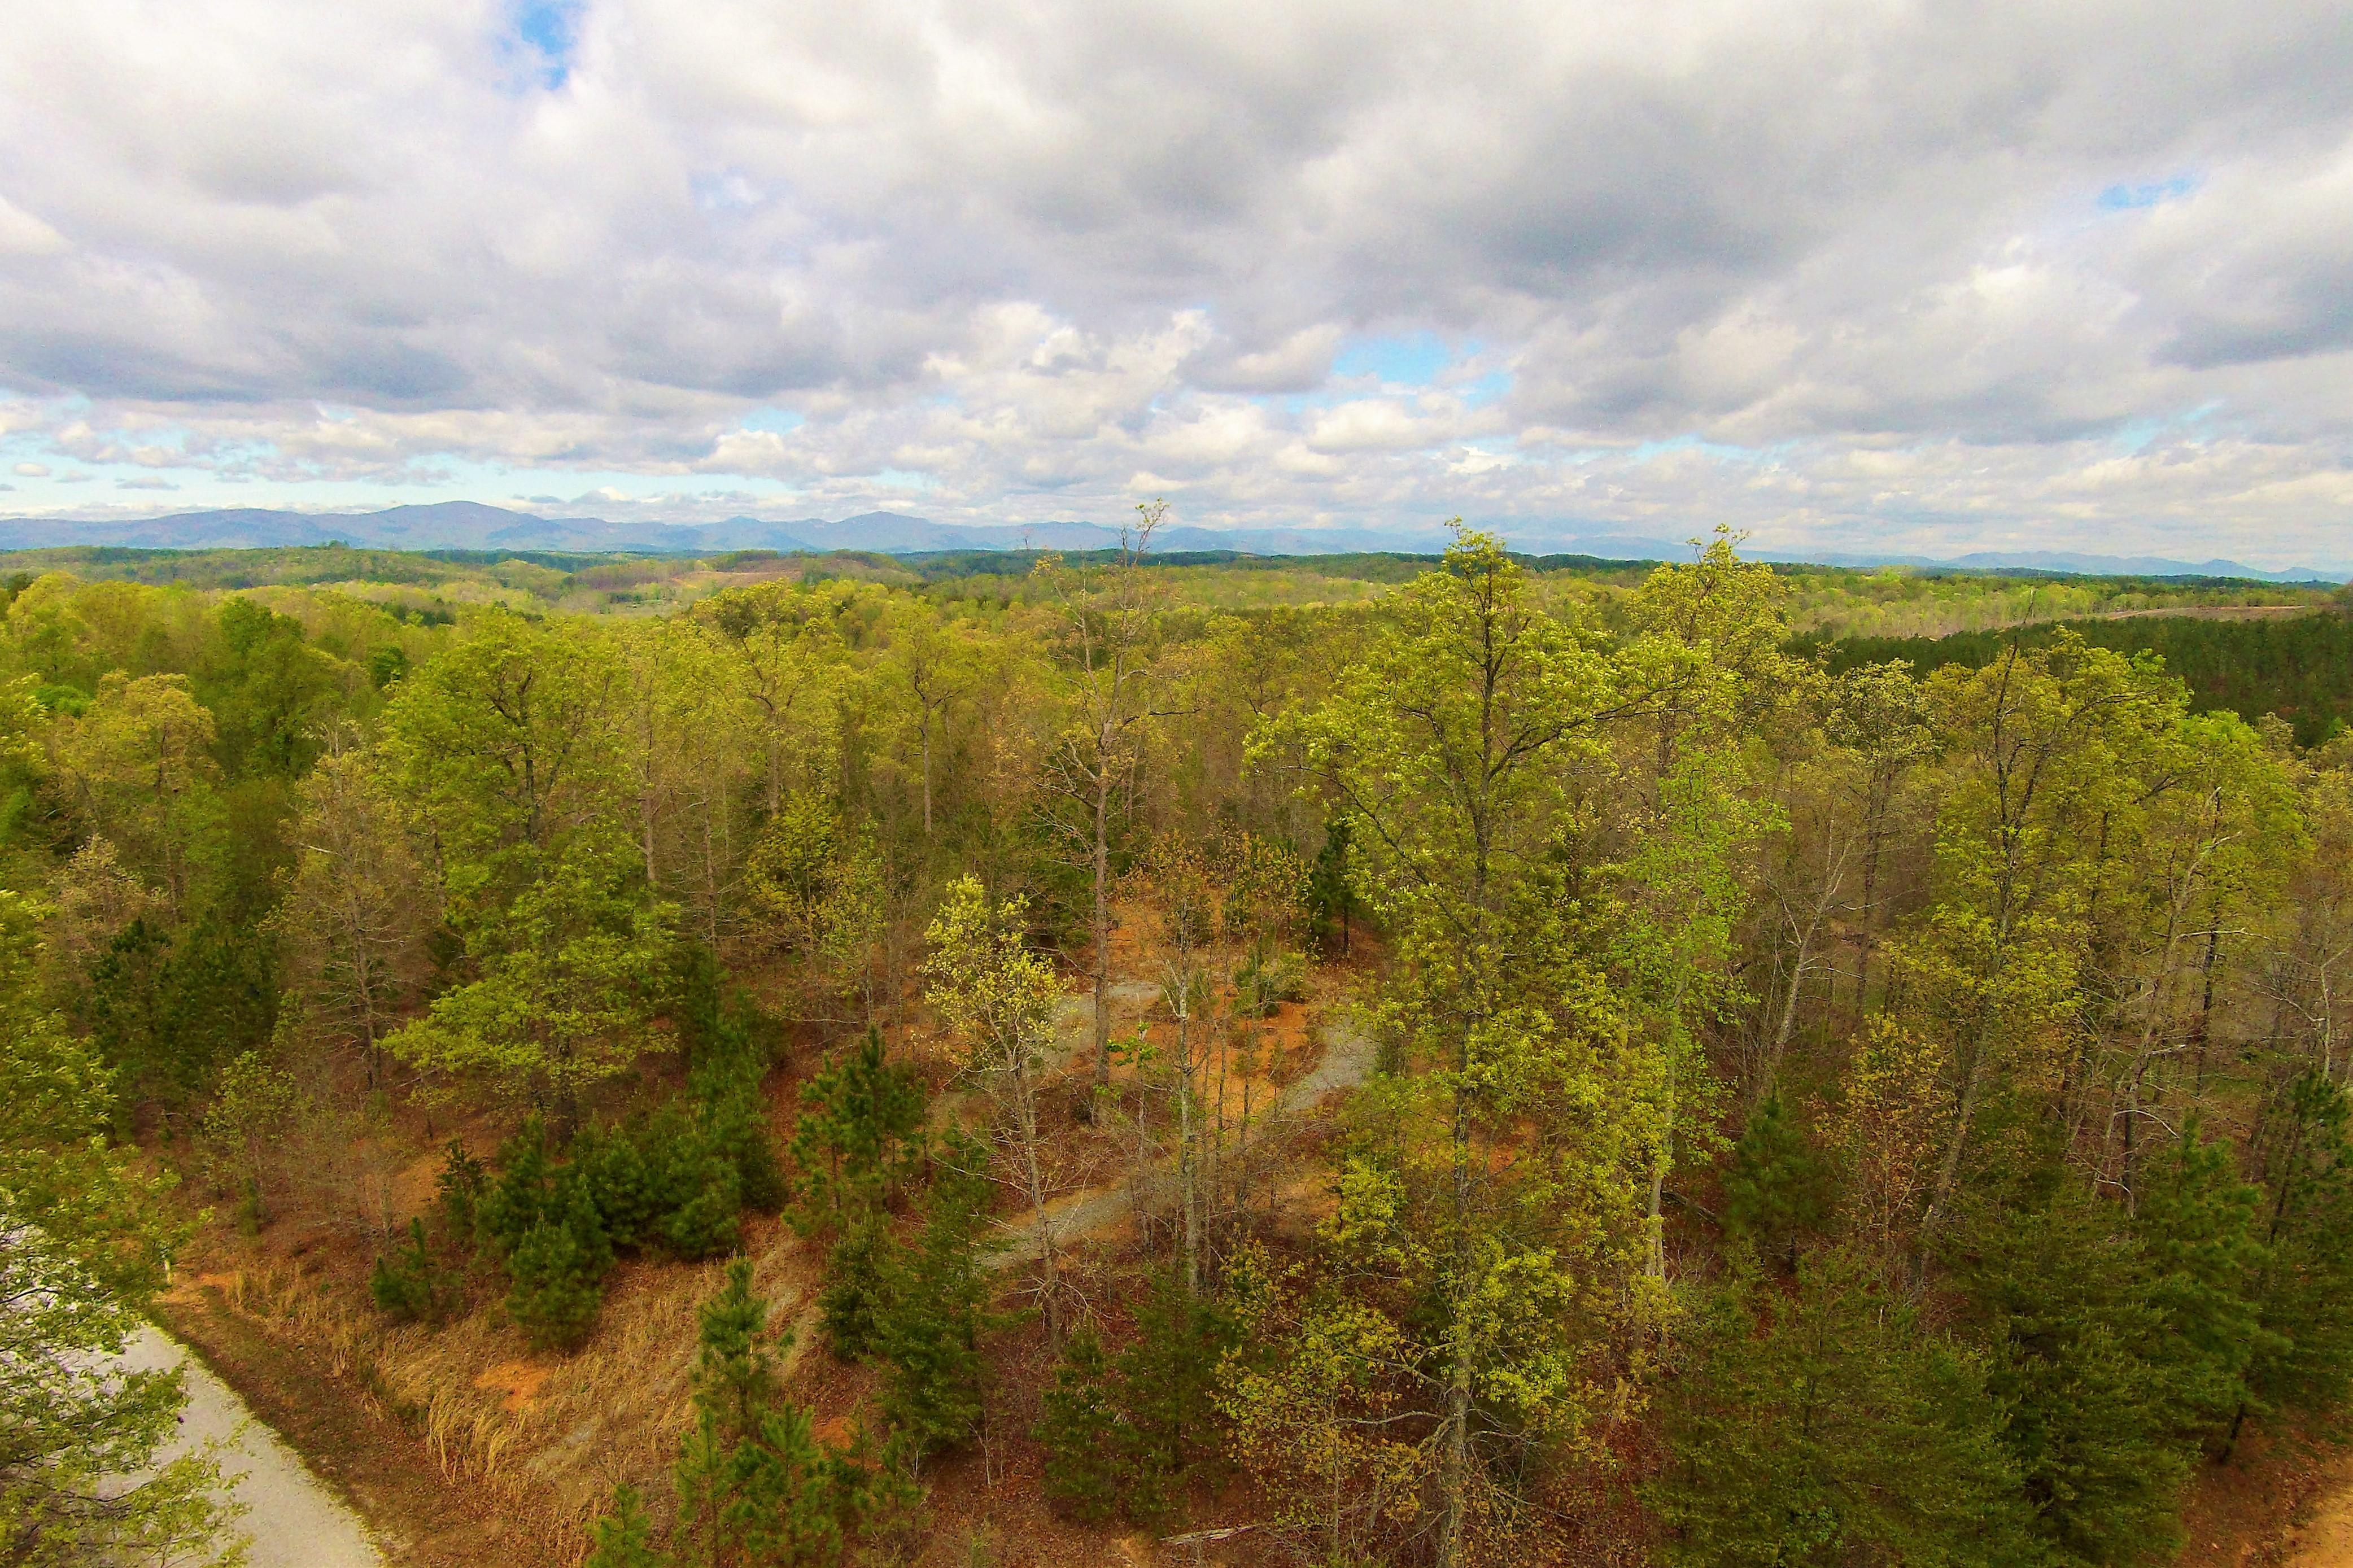 Land for Sale at 4 ac High Ridge Road 129 High Ridge Road Mill Spring, North Carolina, 28756 United States